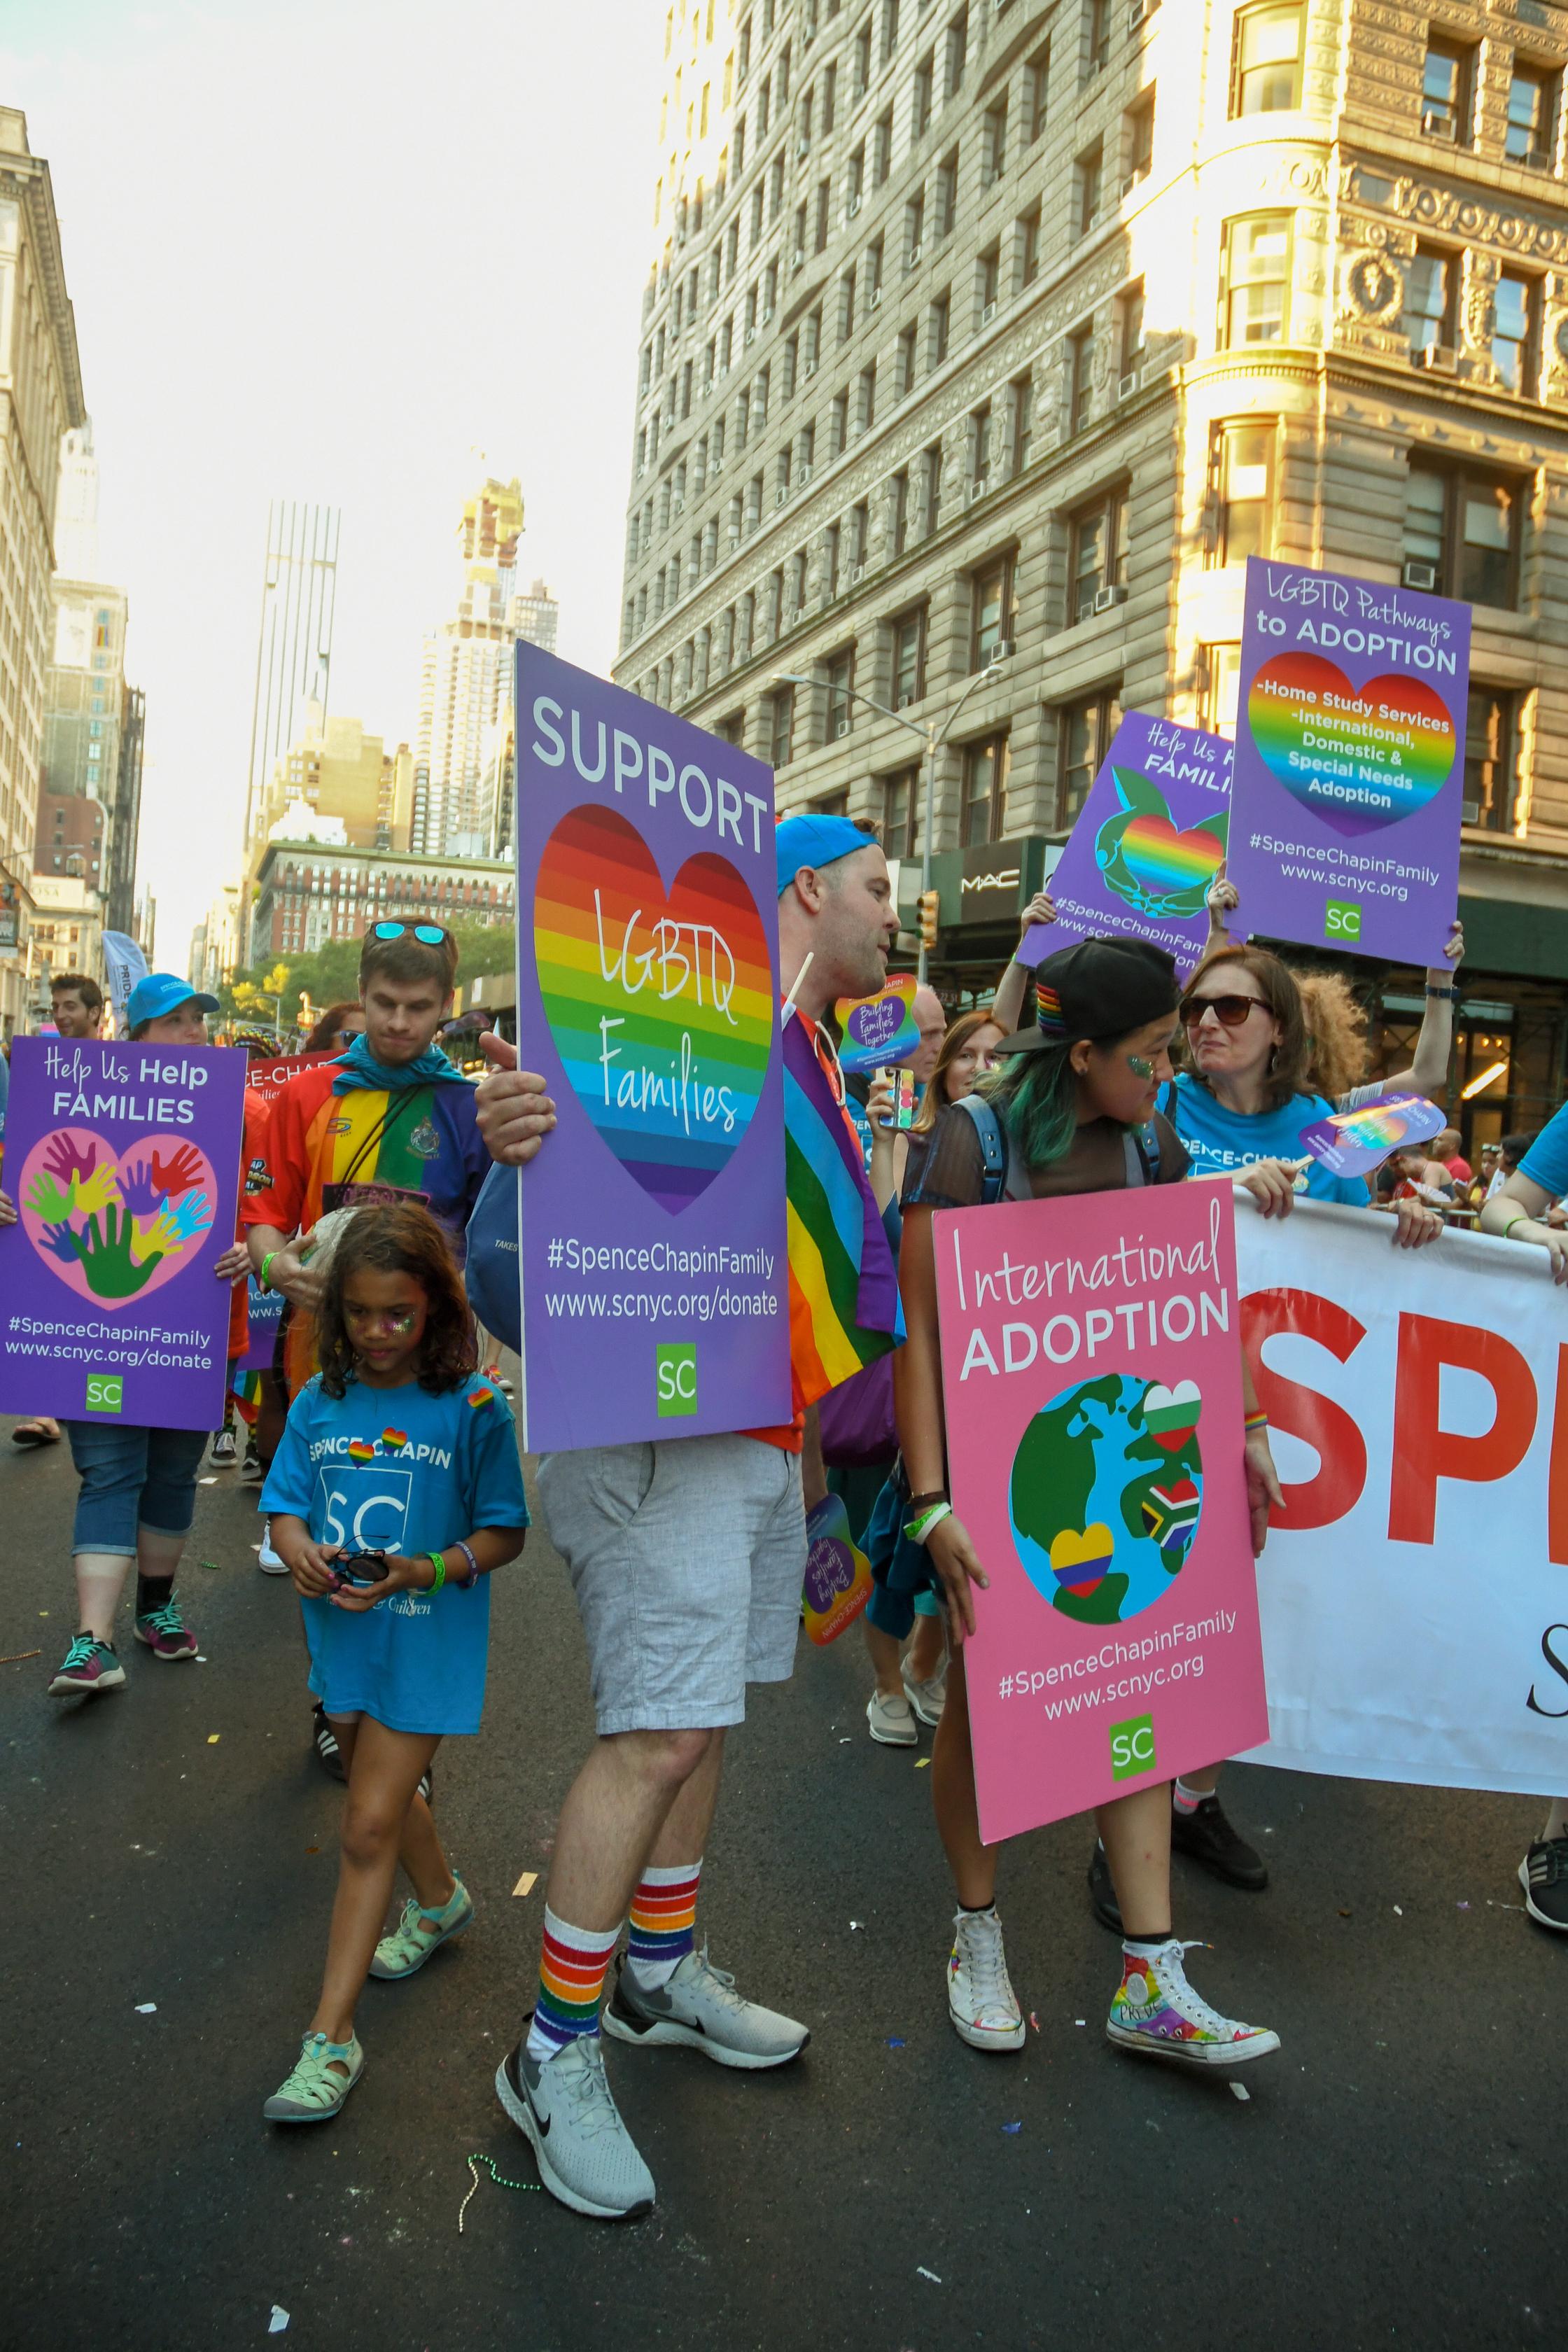 SC-PrideParade-2019_FE-184.jpg